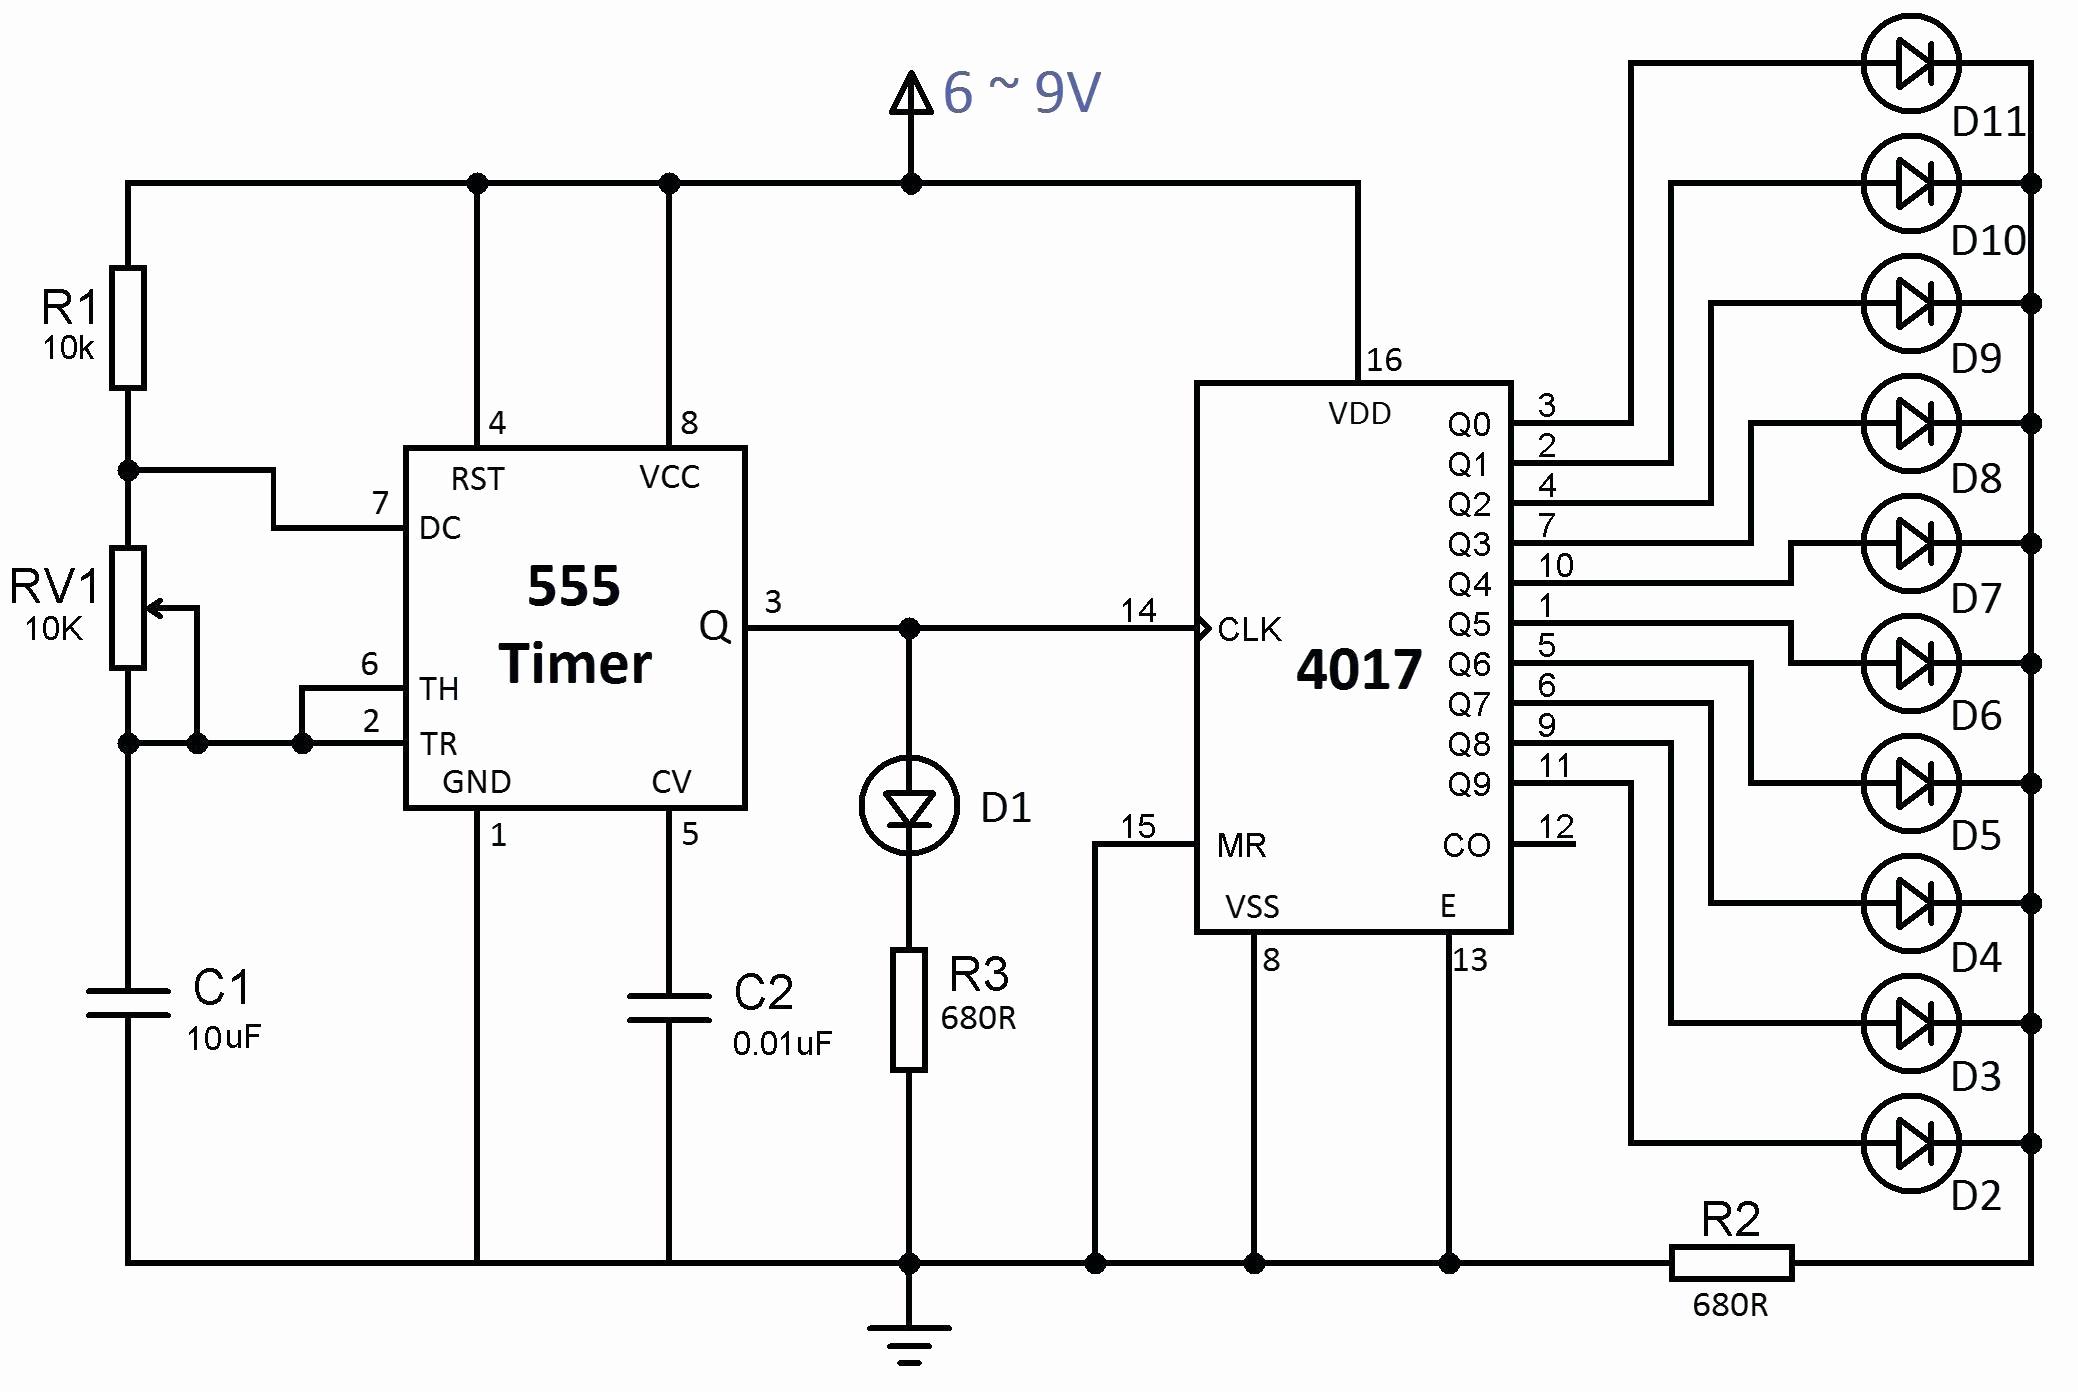 Single Phase Capacitor Start Capacitor Run Motor Wiring Diagram - Capacitor Start Capacitor Run Motor Wiring Diagram